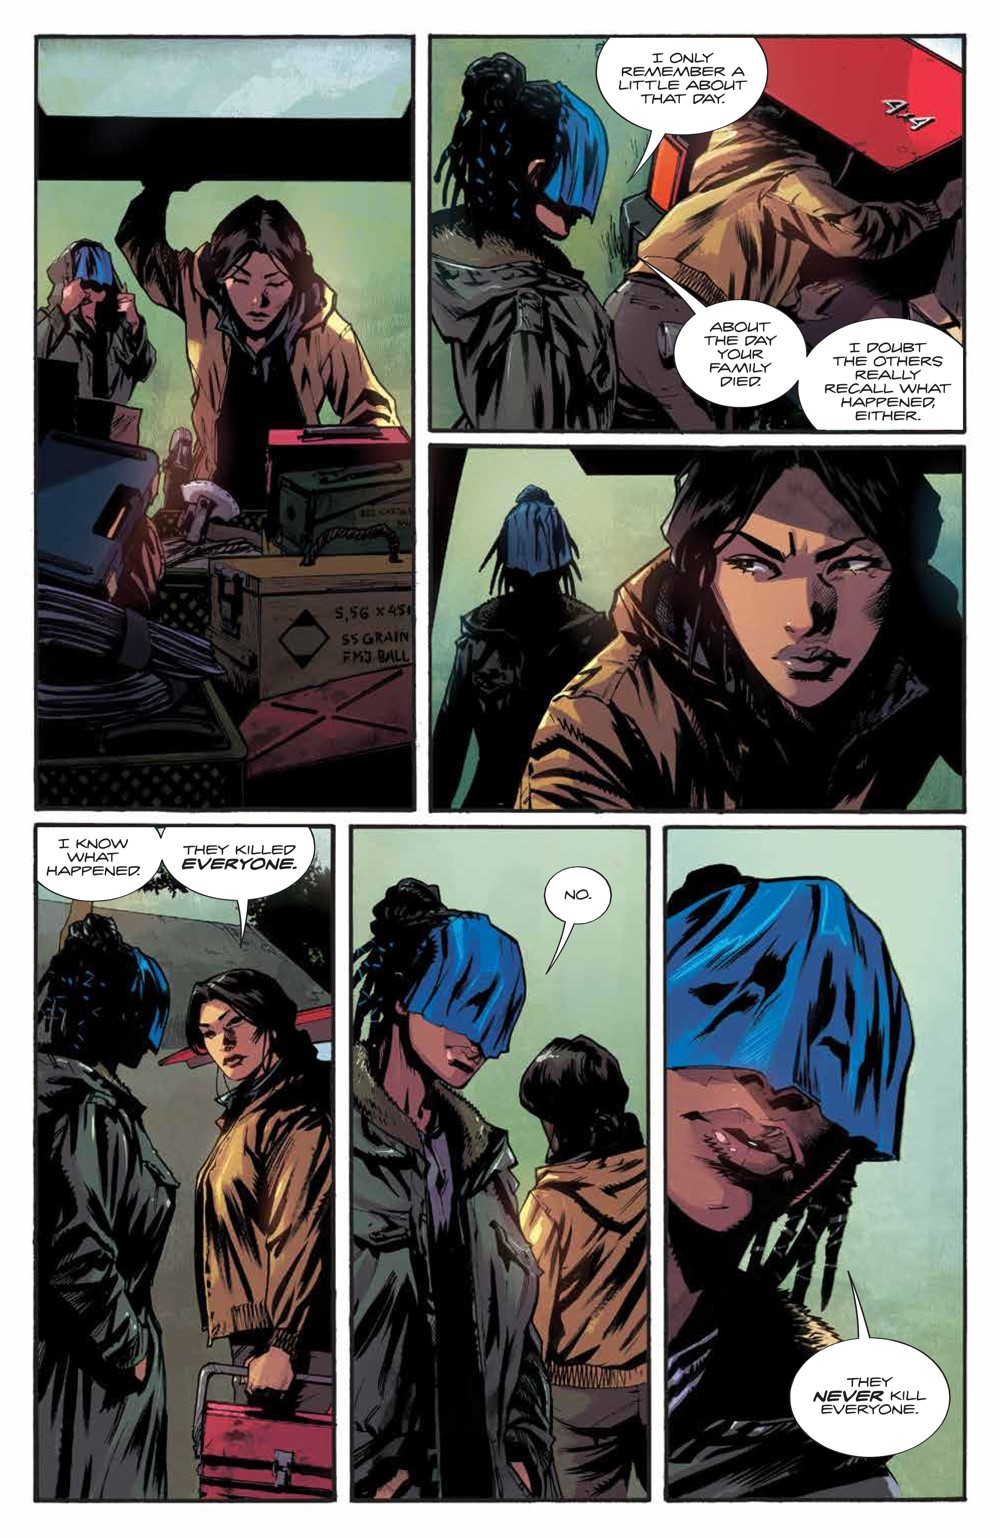 Basilisk_003_PRESS_7 ComicList Previews: BASILISK #3